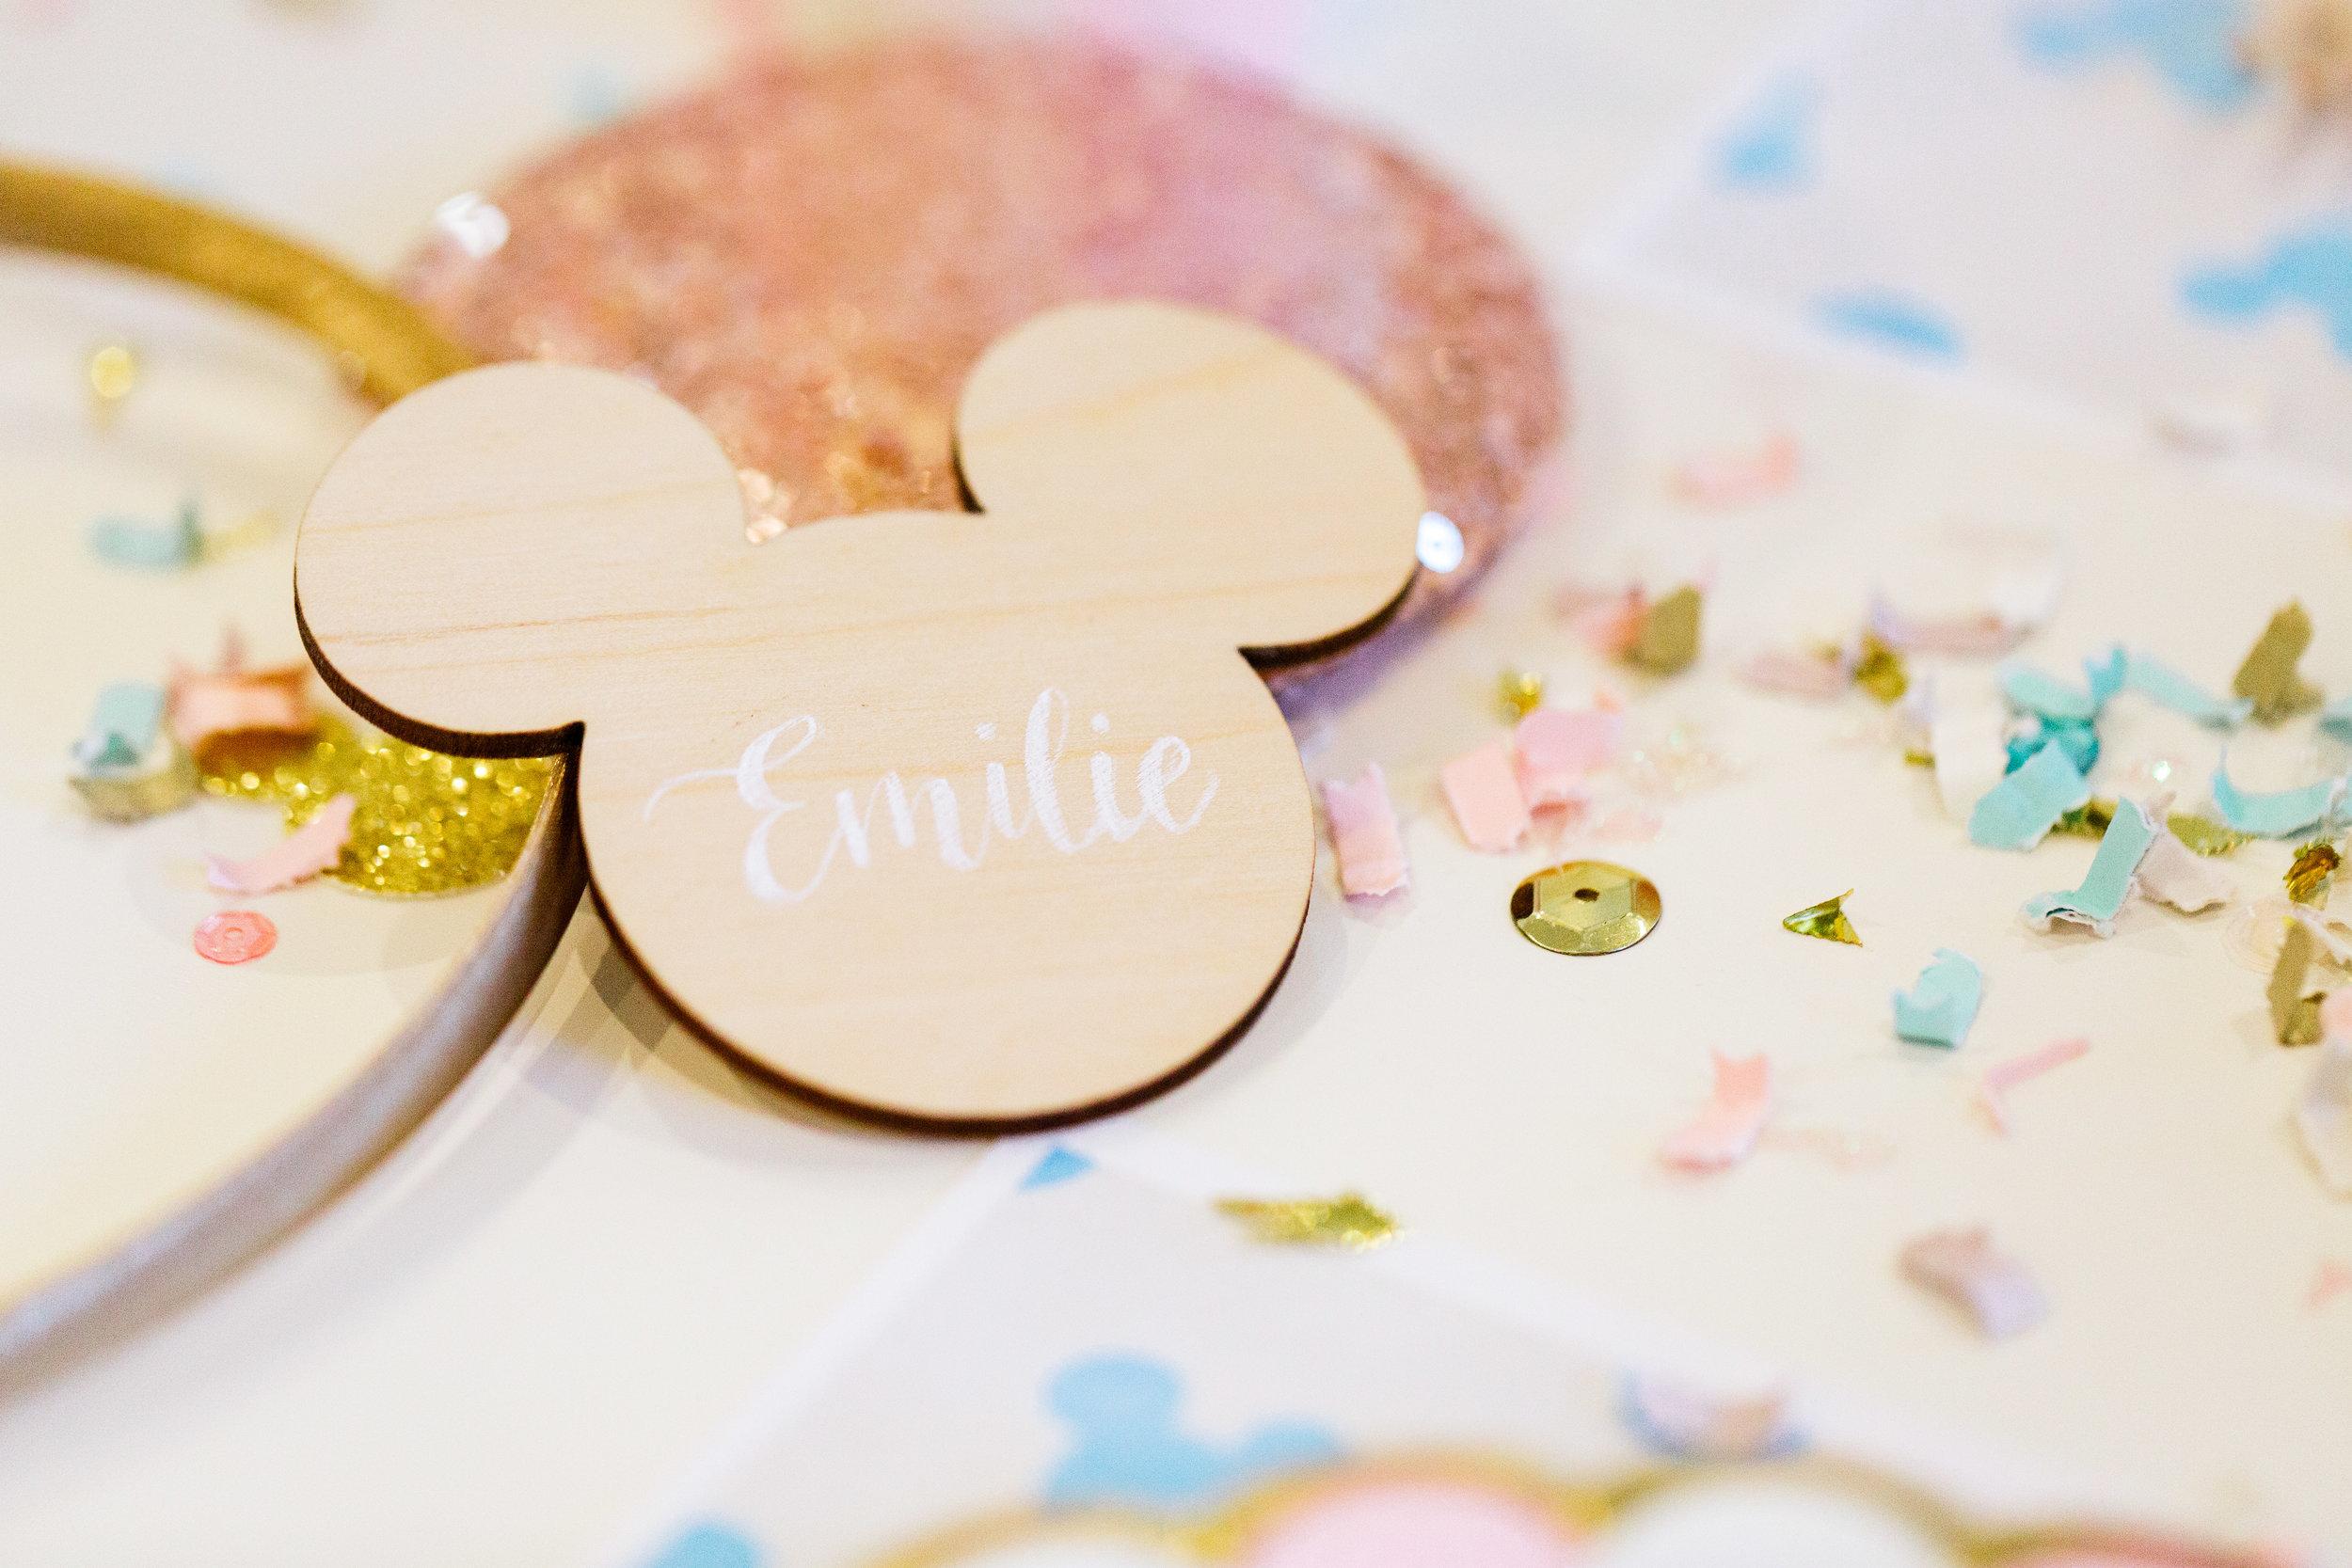 EmilieDo_DisneyBirthday-7.jpg